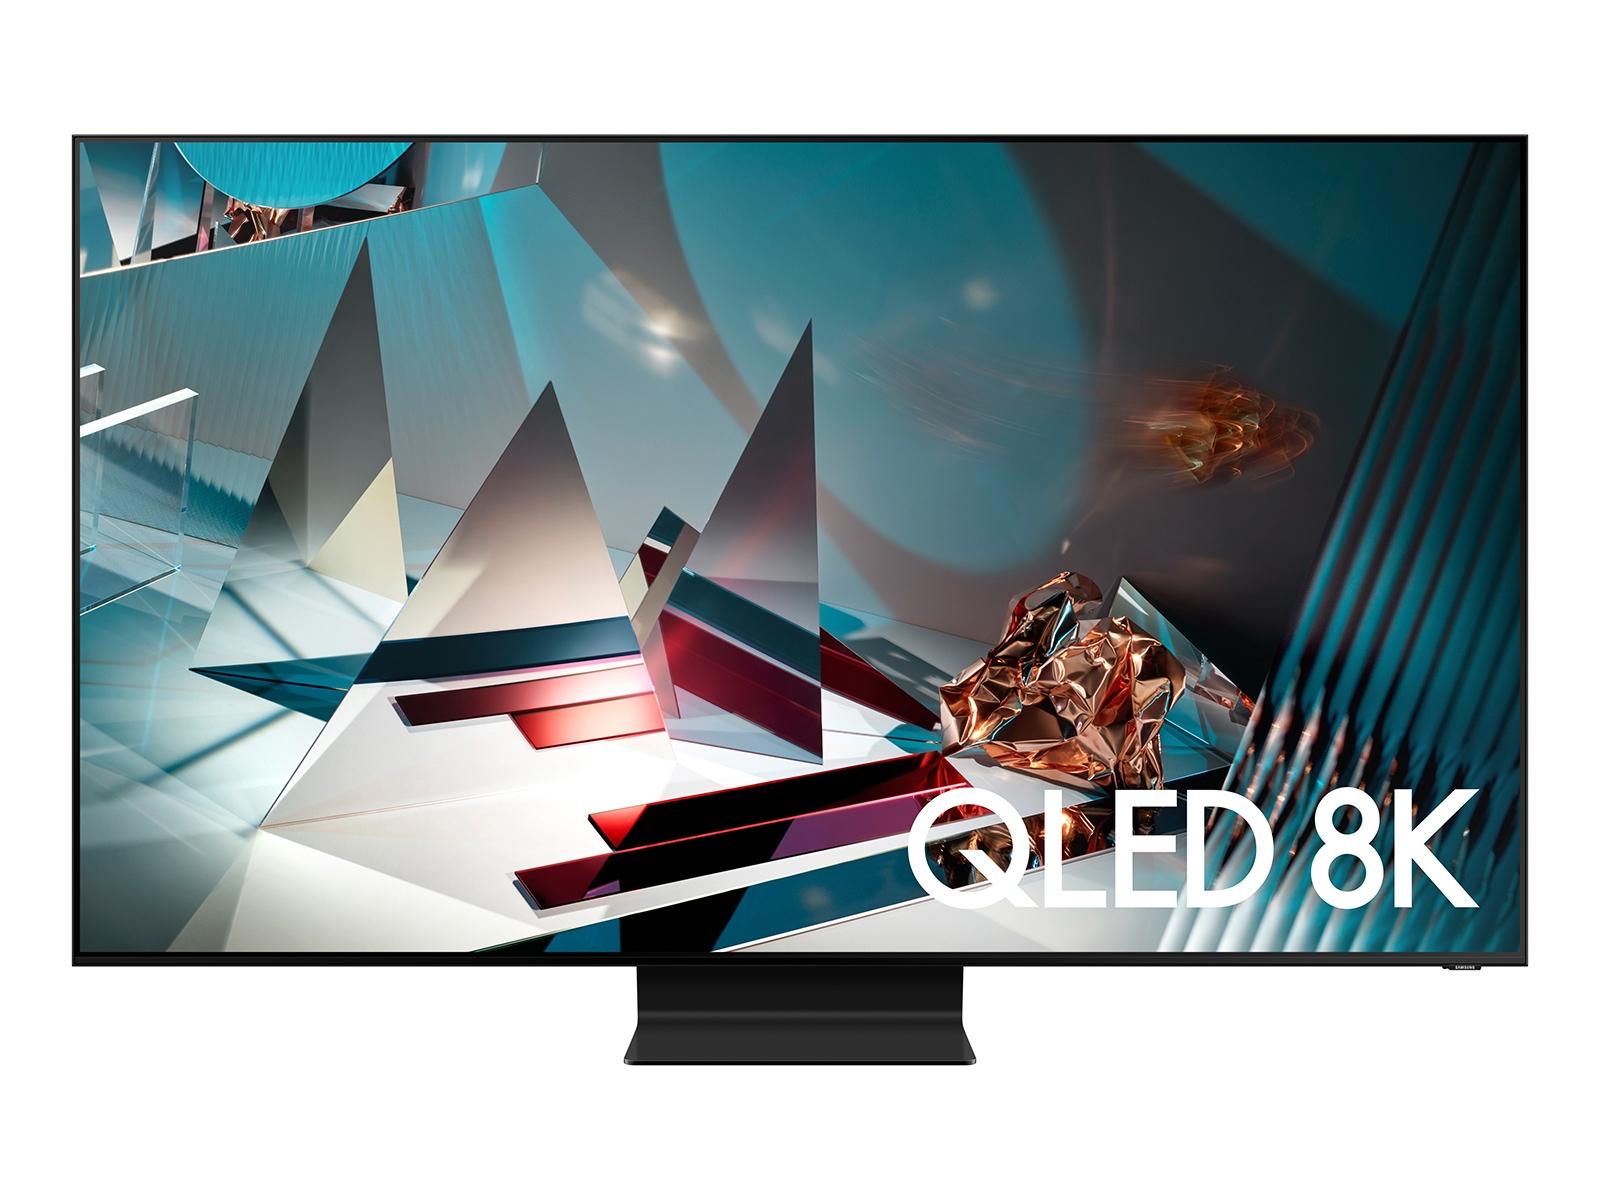 65 Class Q800t Qled 8k Uhd Hdr Smart Tv 2020 Tvs Qn65q800tafxza Samsung Us